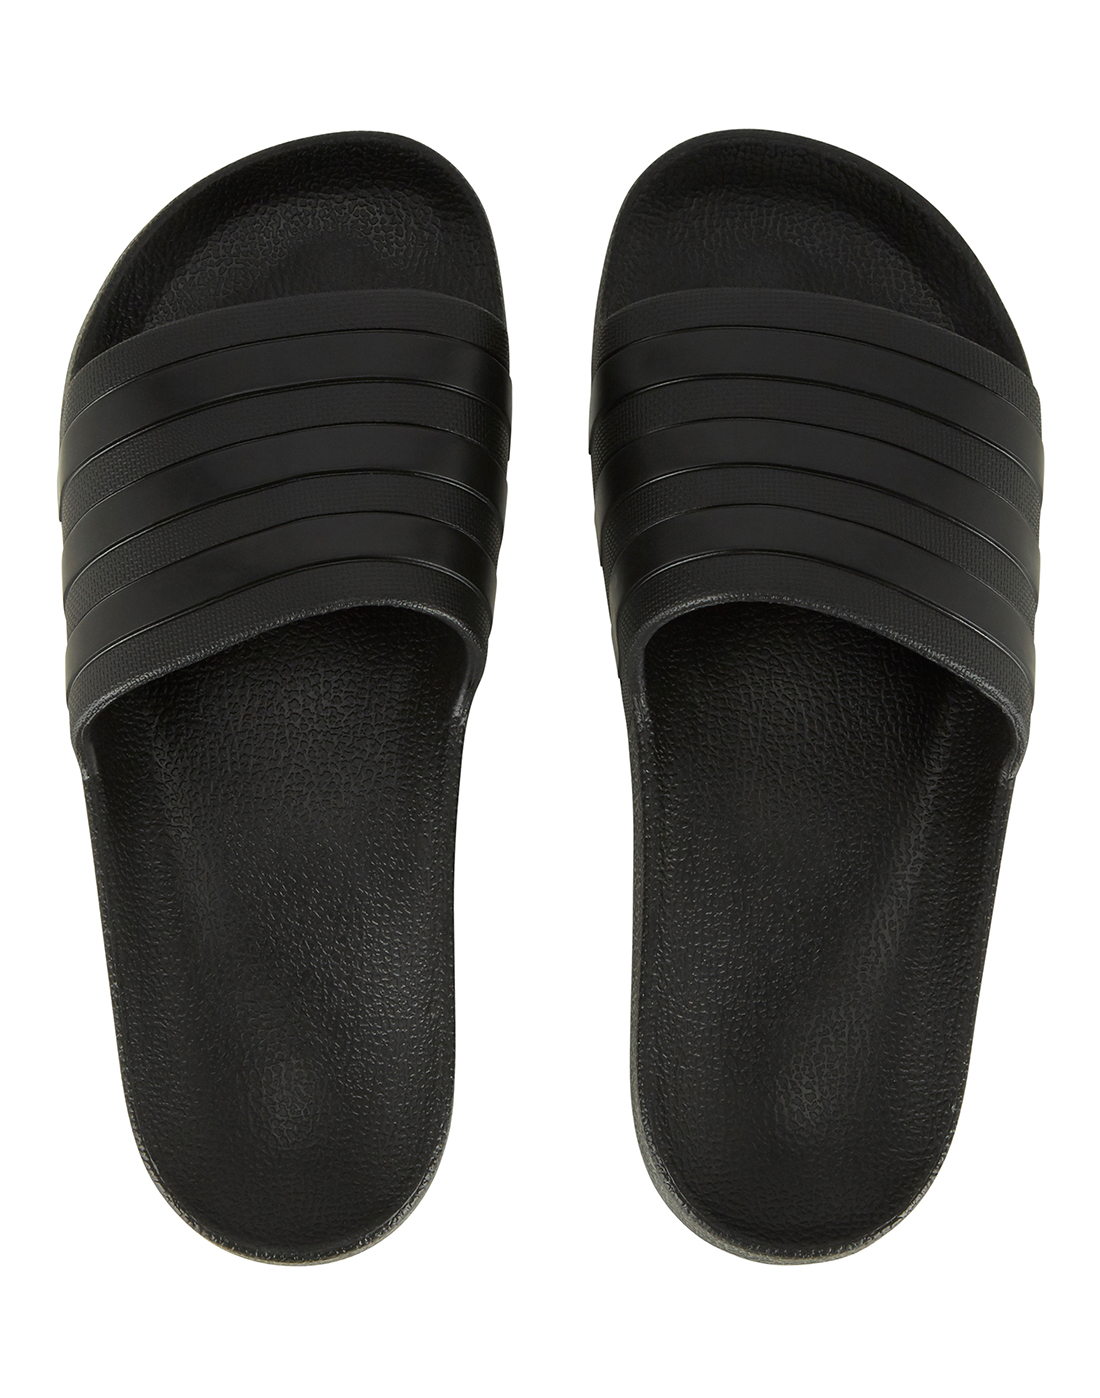 f8886d3c6 adidas Originals. Womens Adilette Aqua Slides. Womens Adilette Aqua Slides  ...